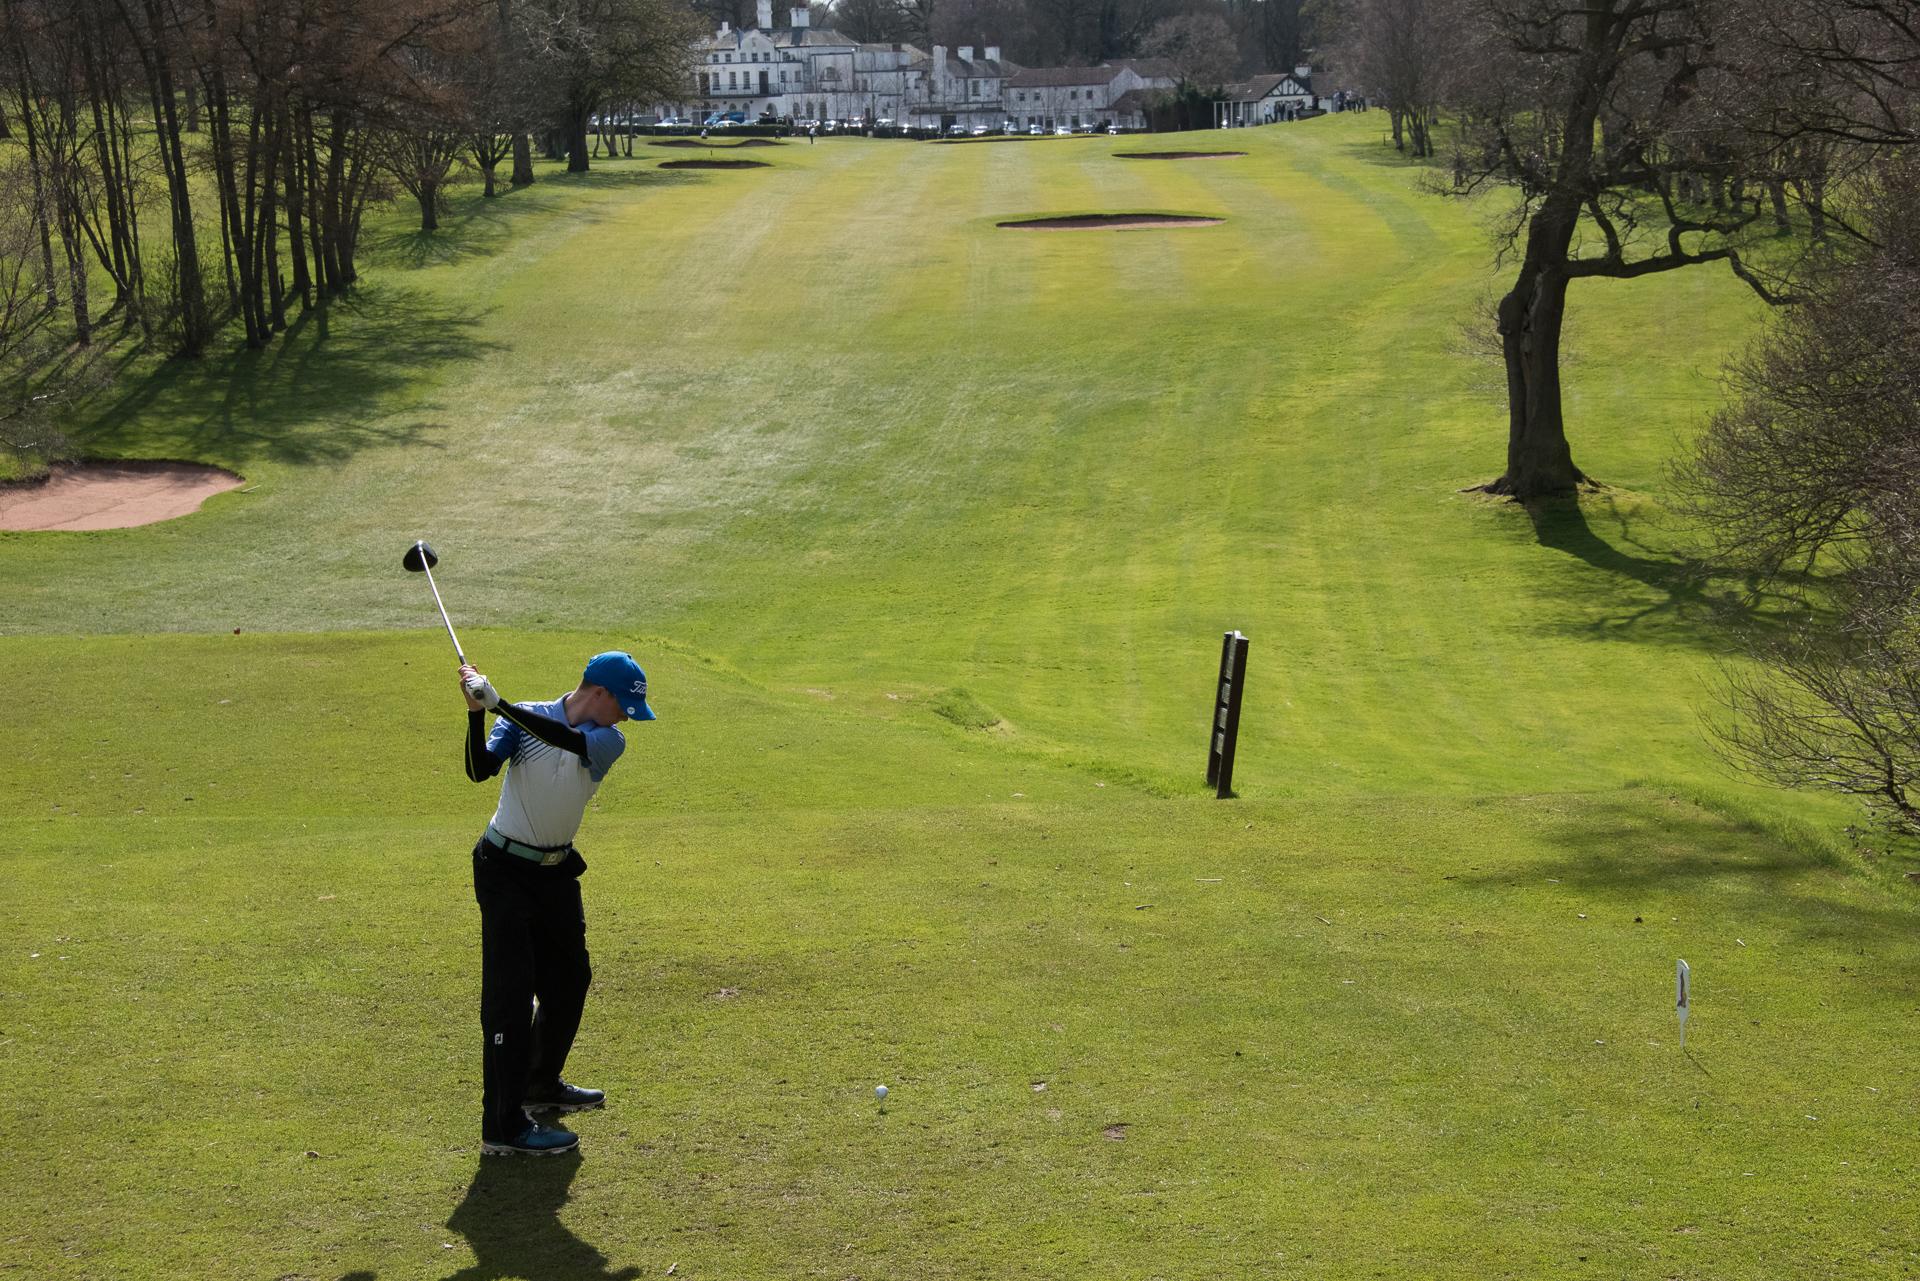 Kevindiss.com golf course photography Hawkstone Park golf course-2770.jpg